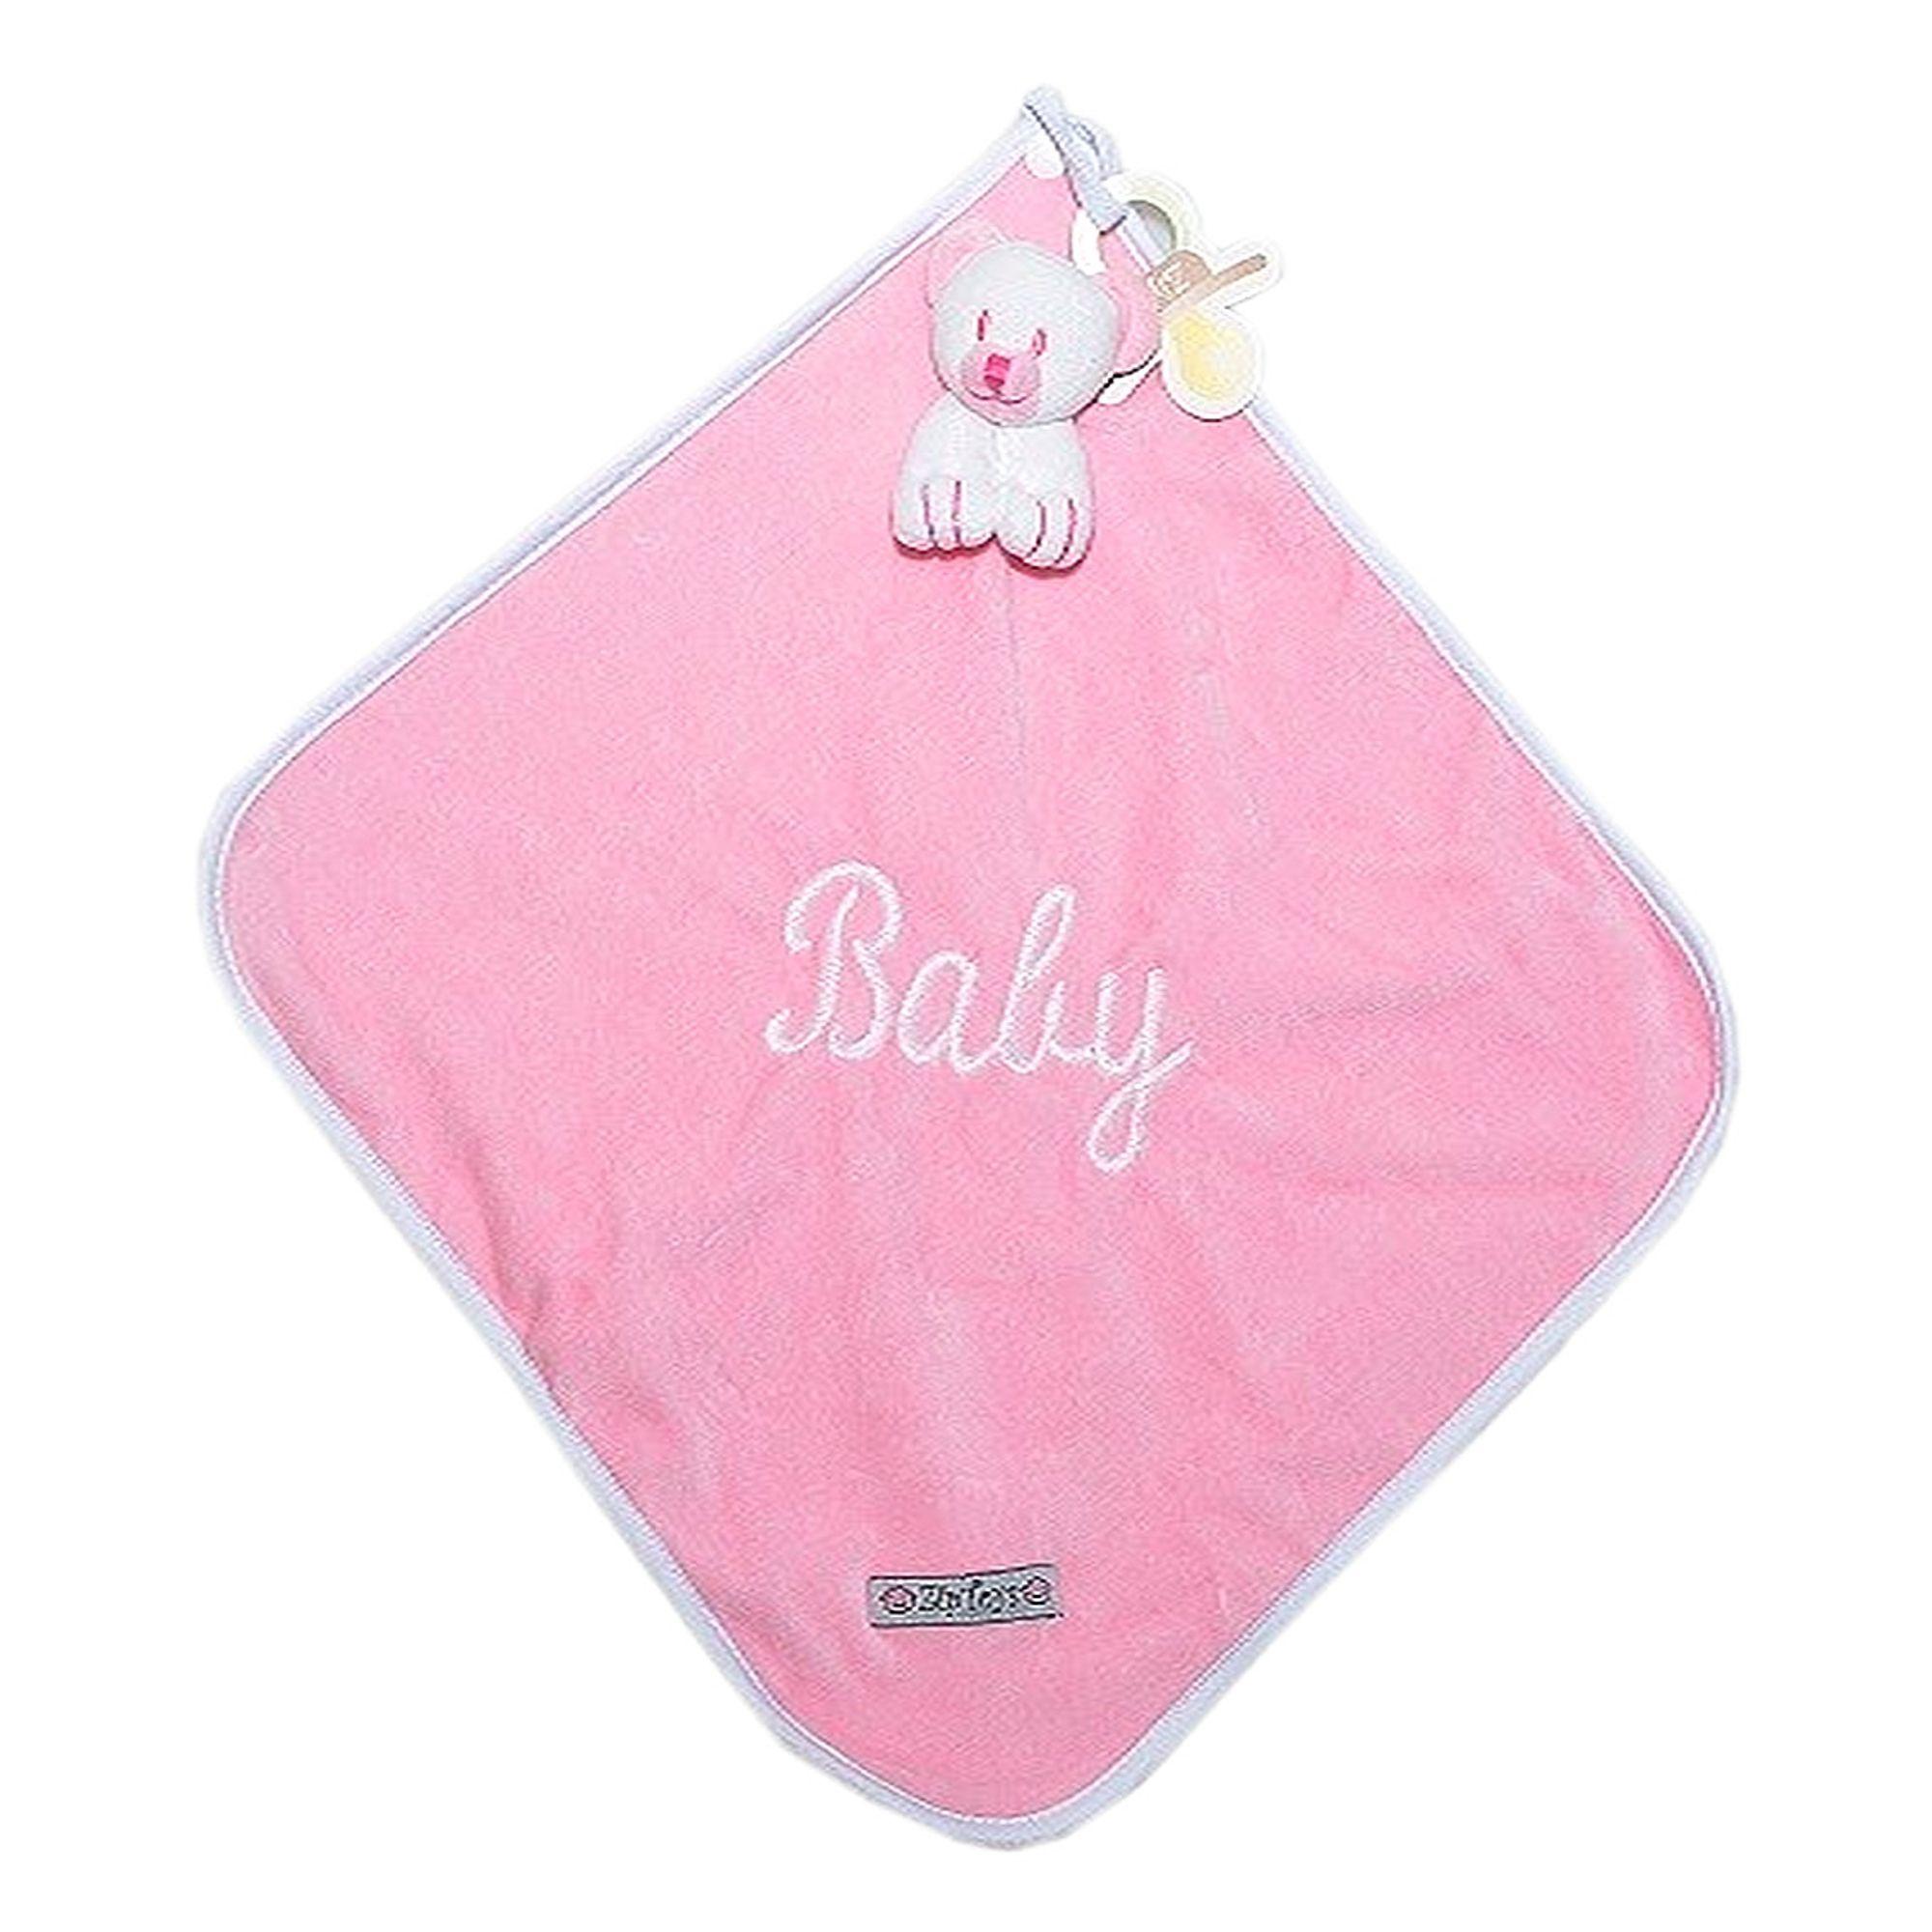 blanket-naninha-cetim-baby-urso-rosa-zip-toys